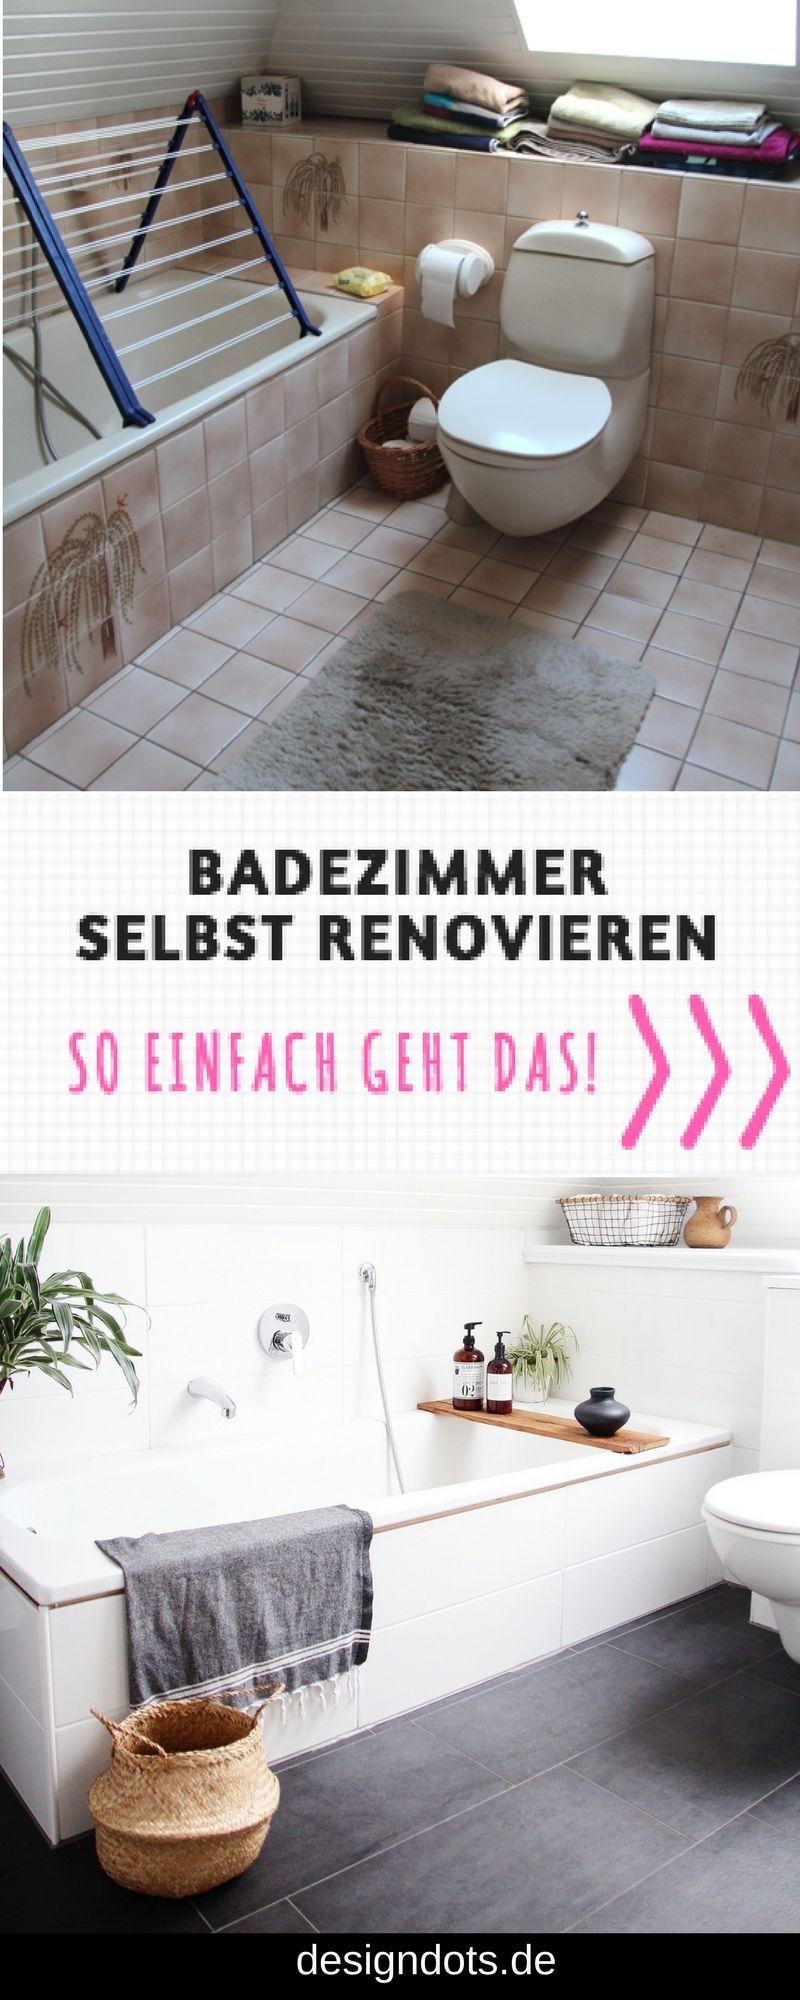 Badezimmer ideen fliesen dusche badezimmer selbst renovieren vorhernachher  skandinavische